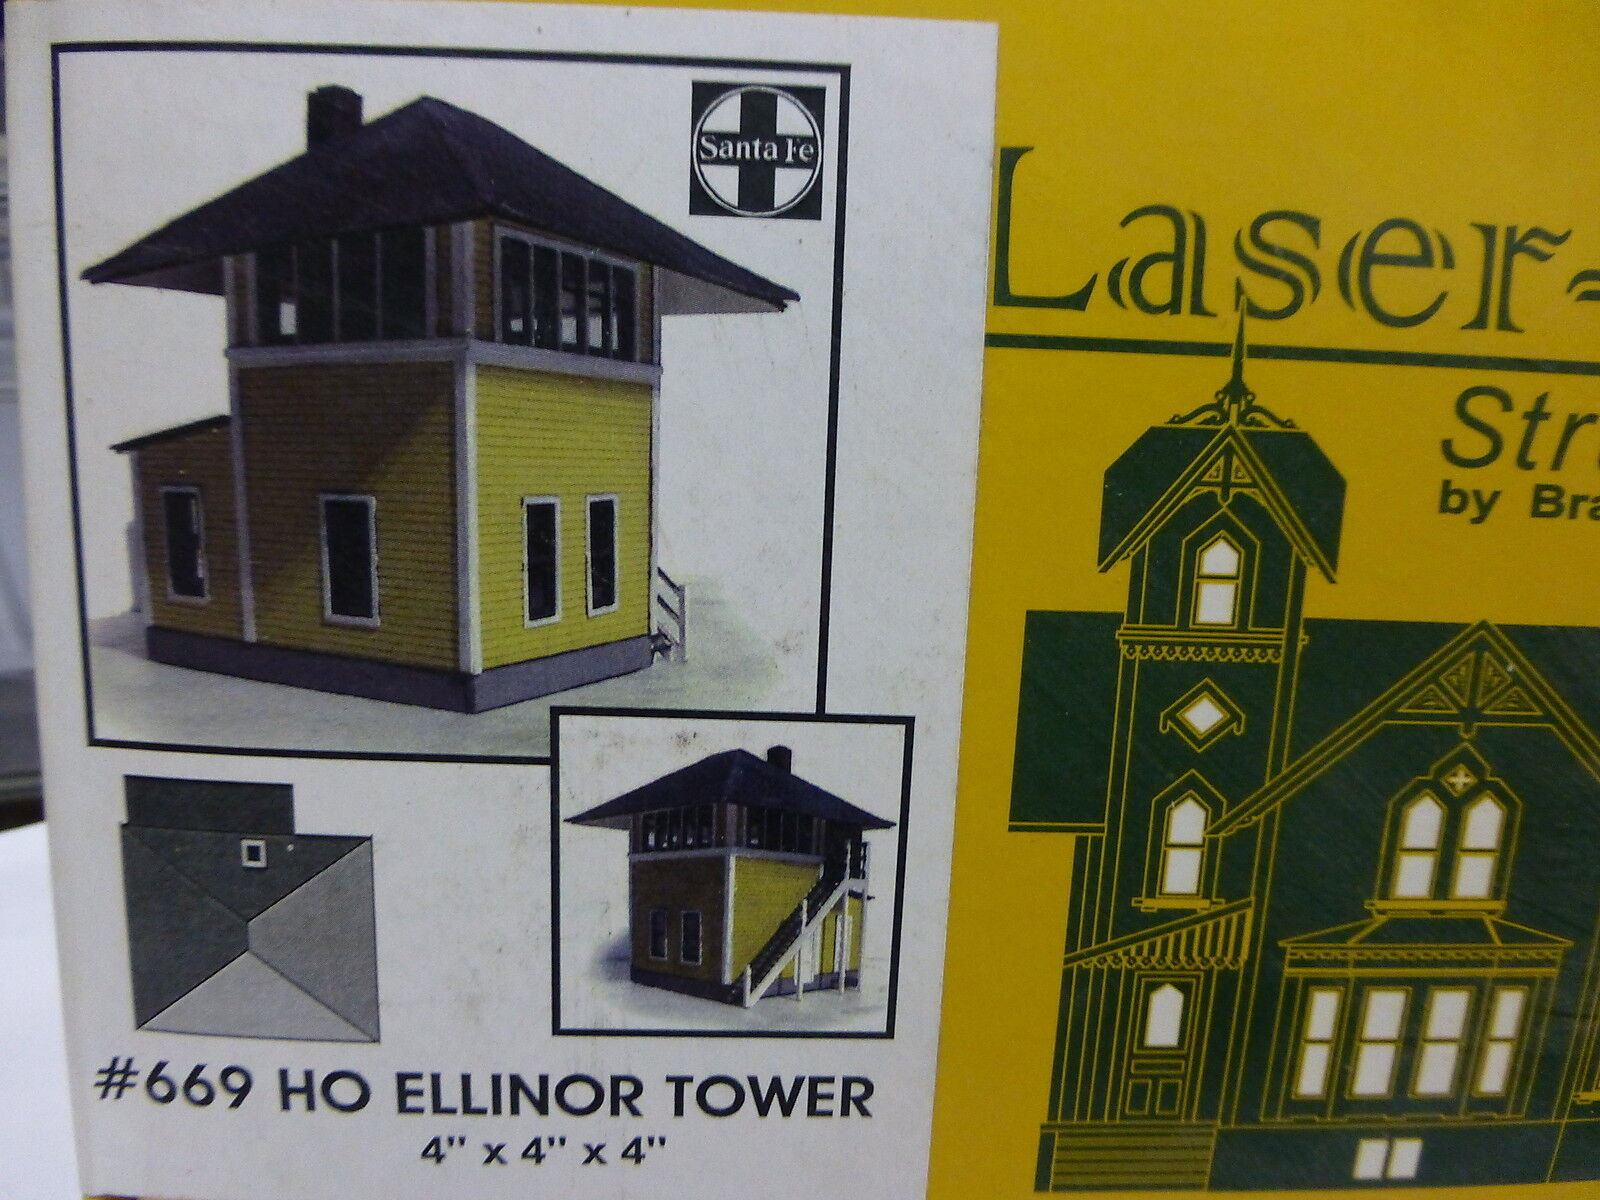 Branchline N Ellinor Tower 4  x 4  x 4  Laser-Art Kit form